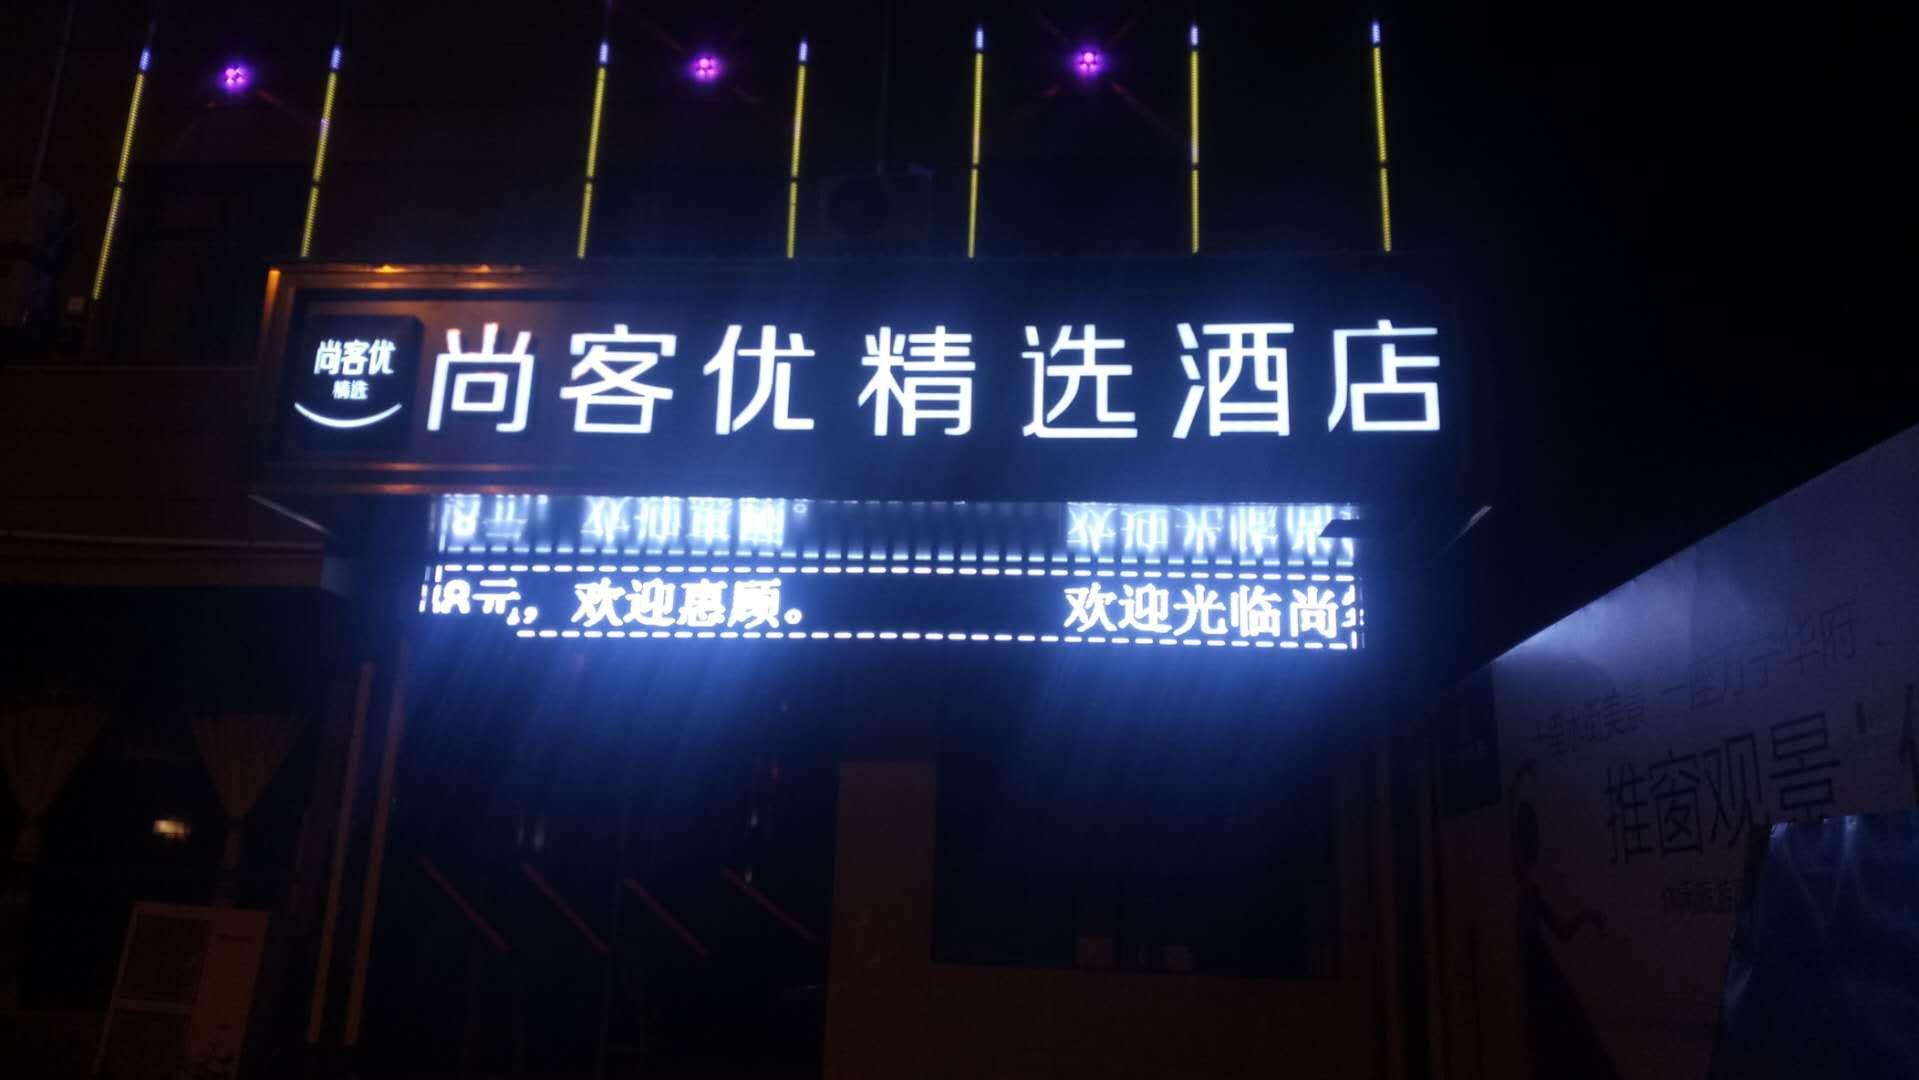 Thank Inn Plus Hotel Shanxi Ankang Pingli County Yingbin Avenue